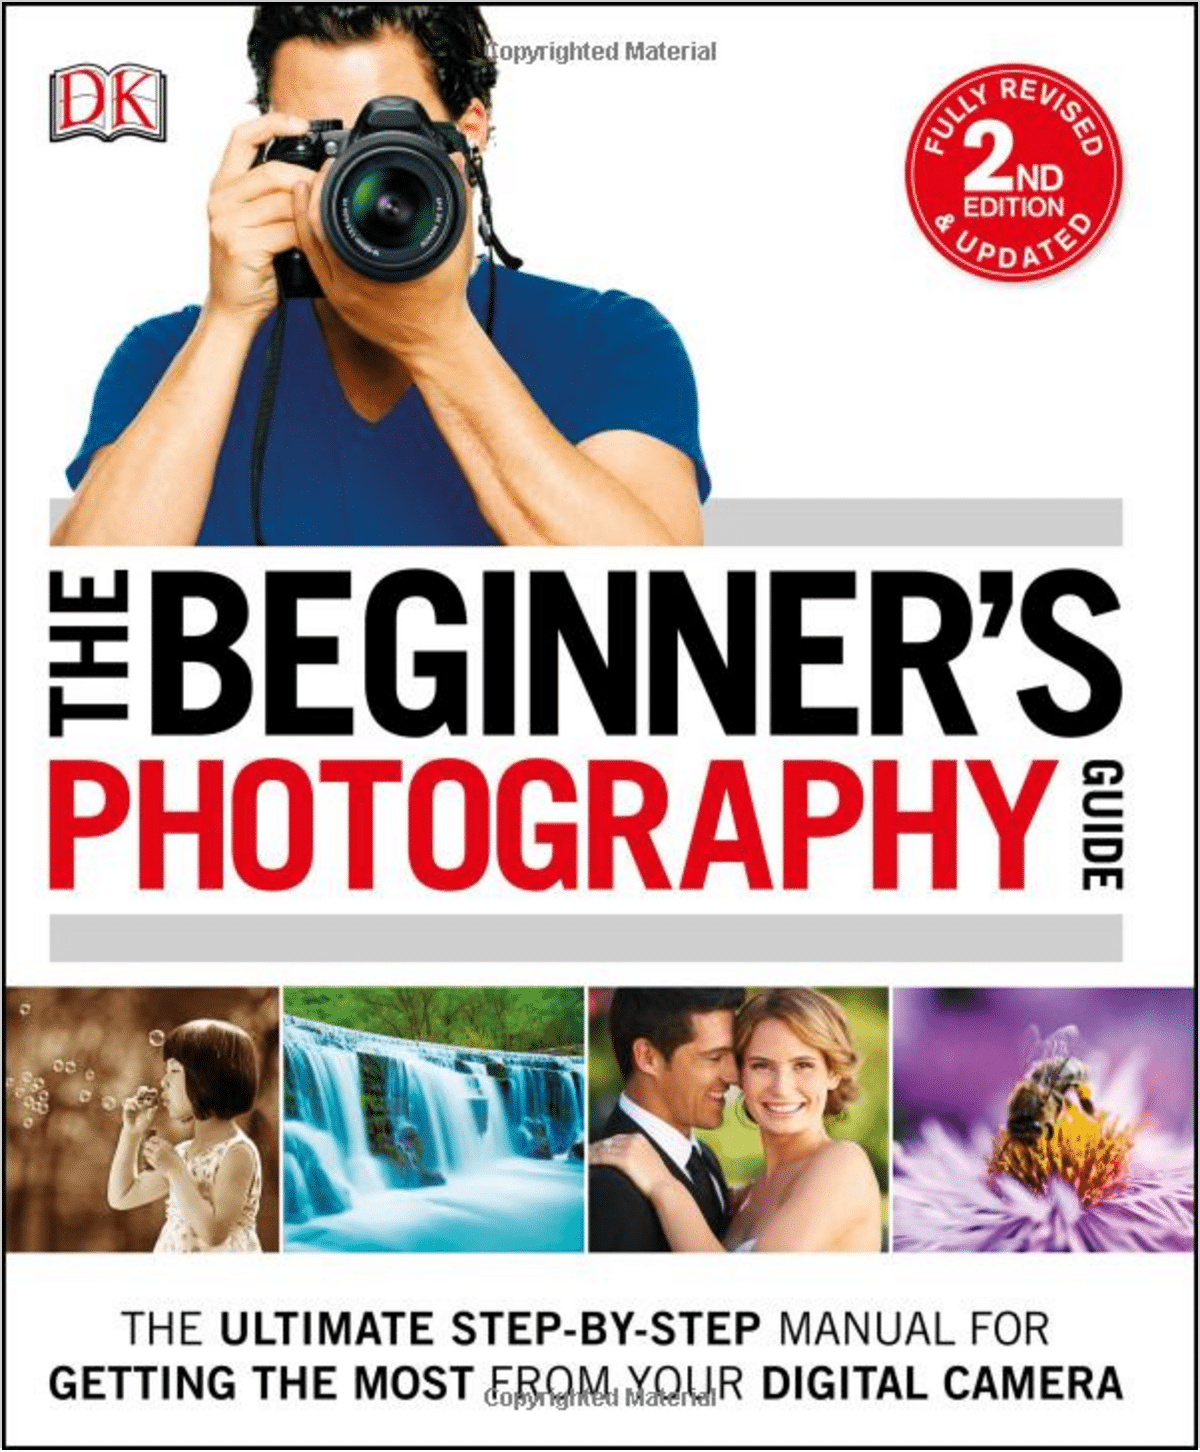 fireshot-capture-1-the-beginners-photography-guide-2nd-_-https___www-amazon-com_beginners-ph